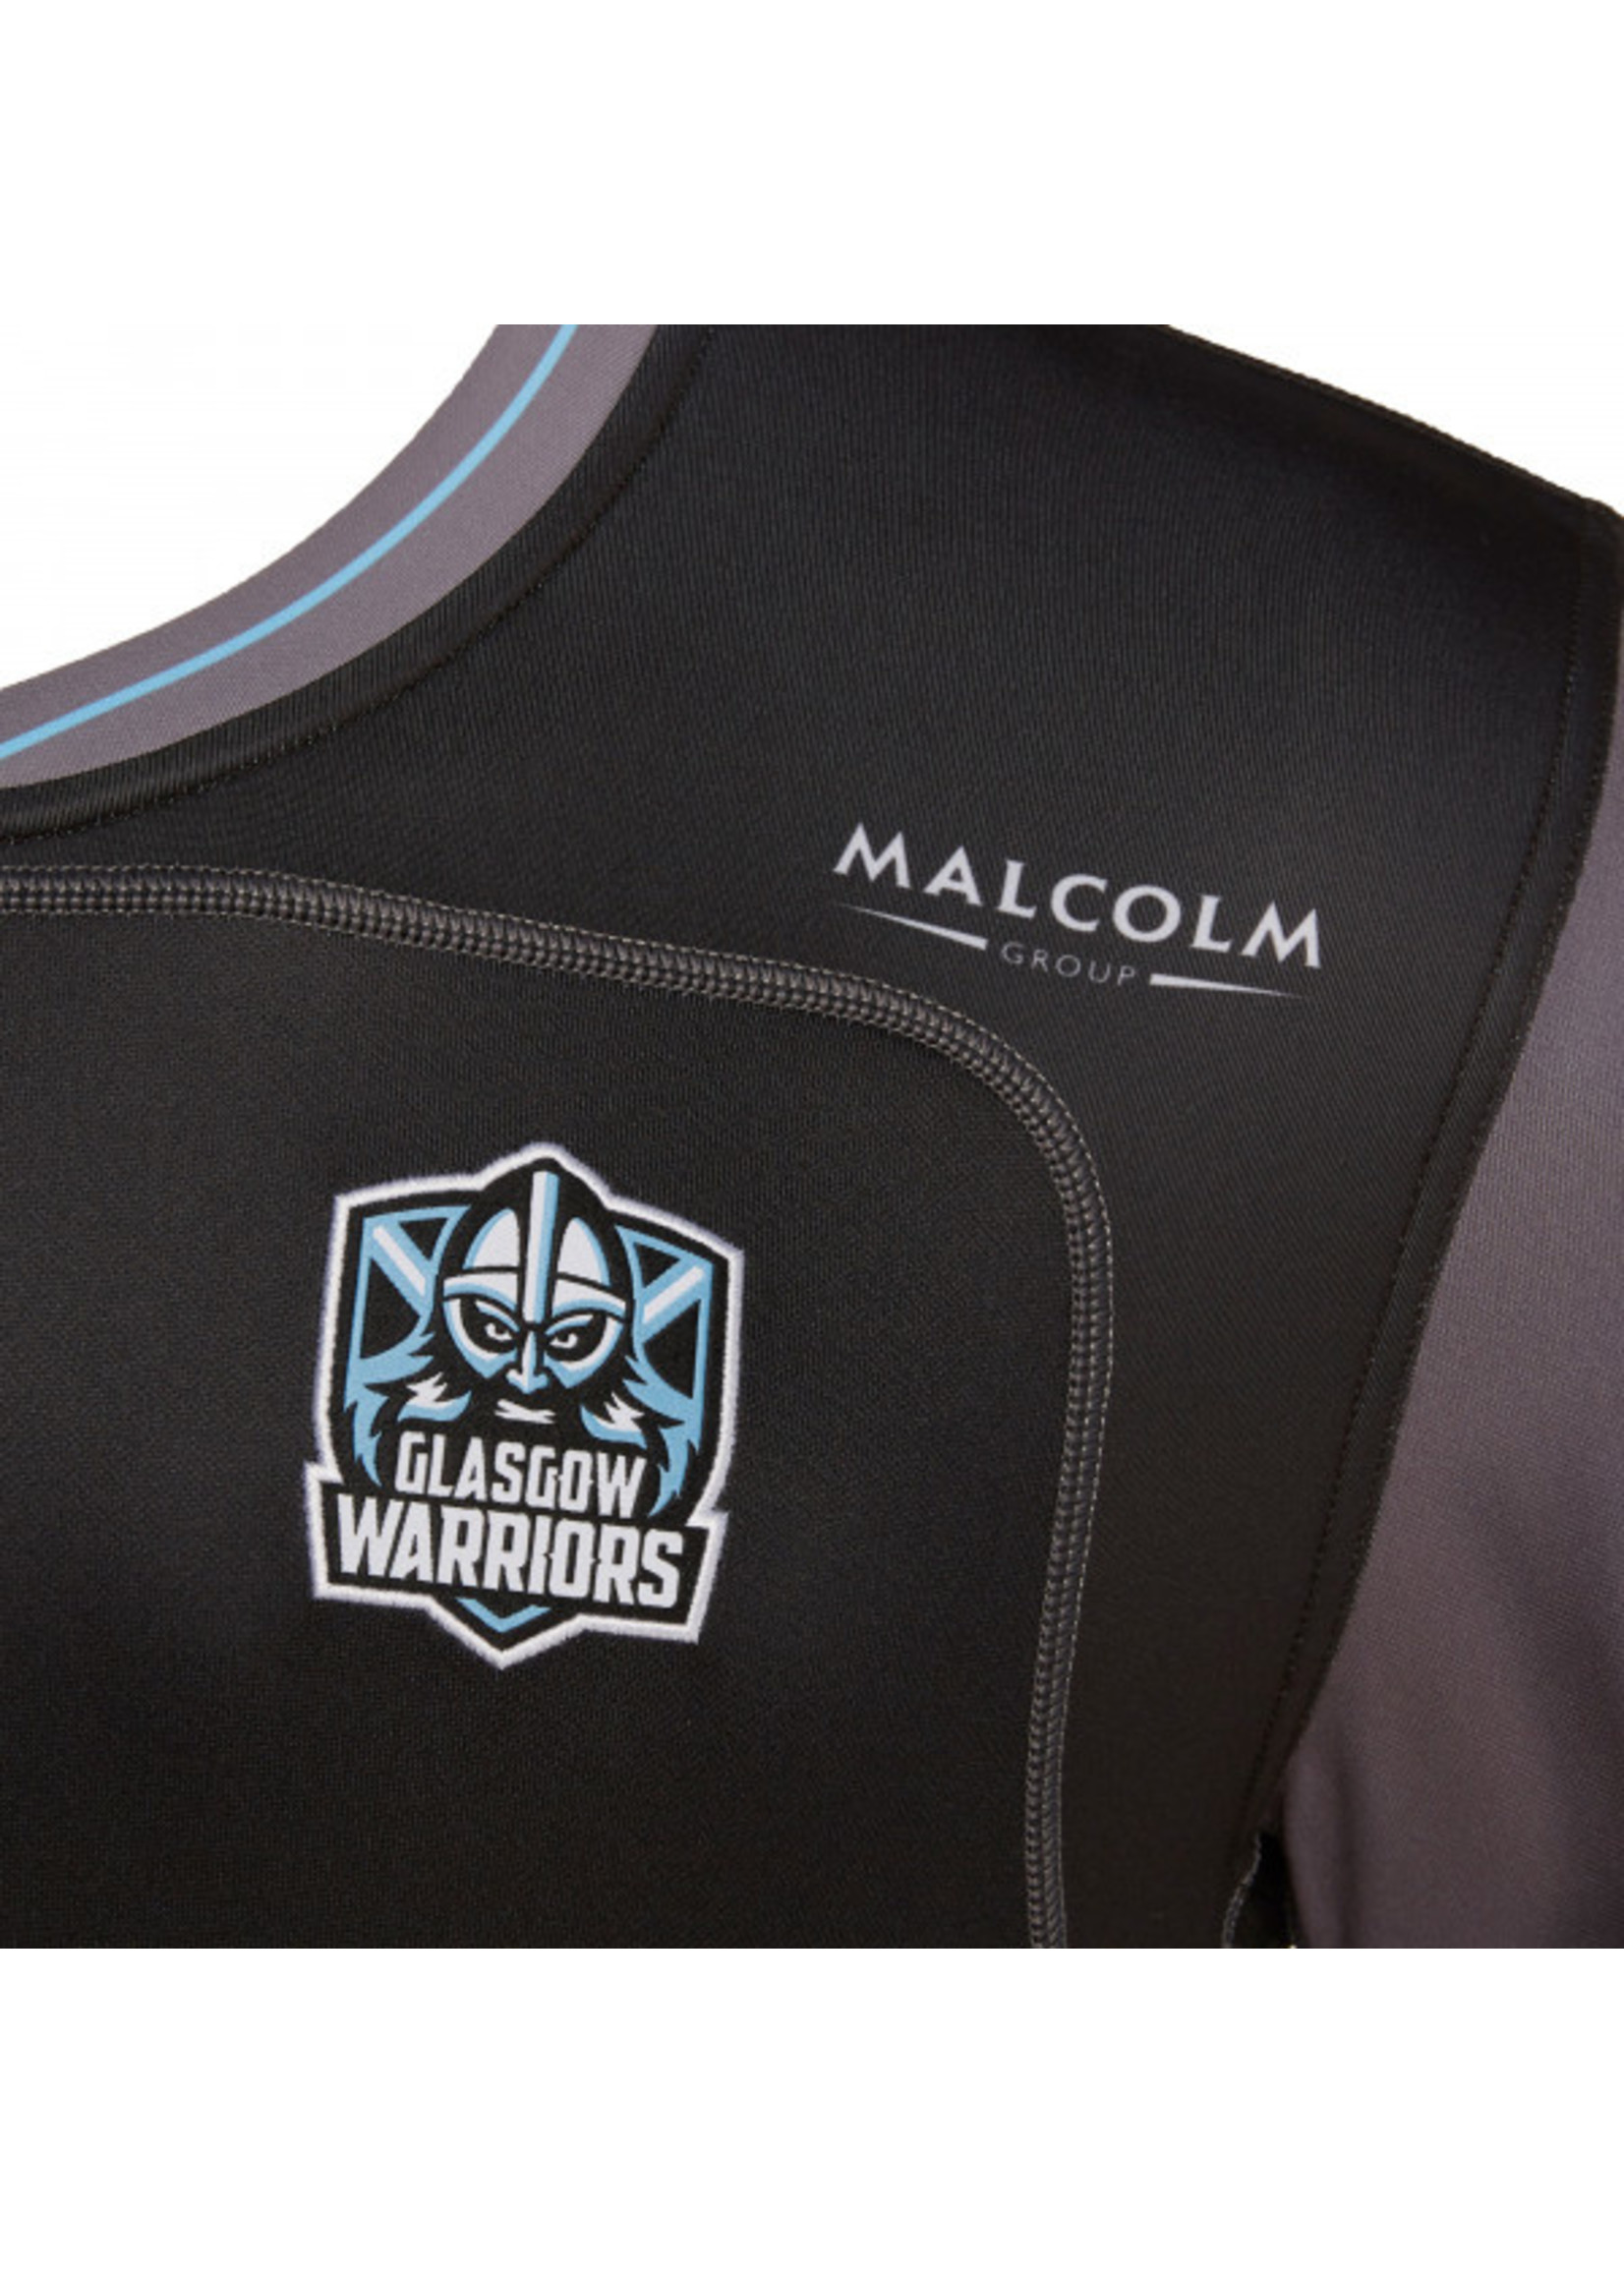 Macron Macron Glasgow Warriors M19 Senior Home Replica Shirt (2019/20)